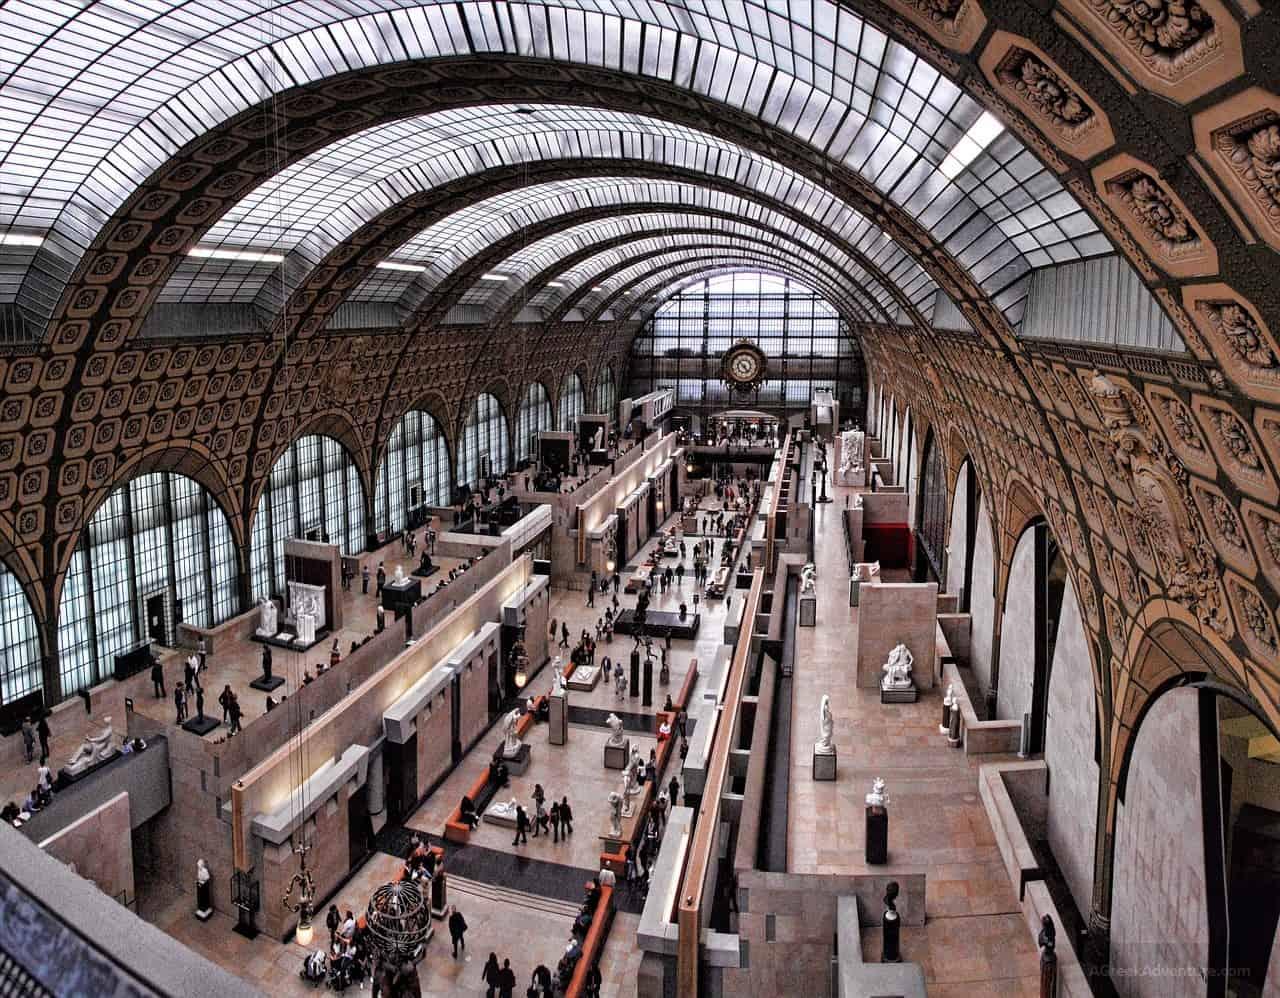 The World's Top Museums According to Tripadvisor